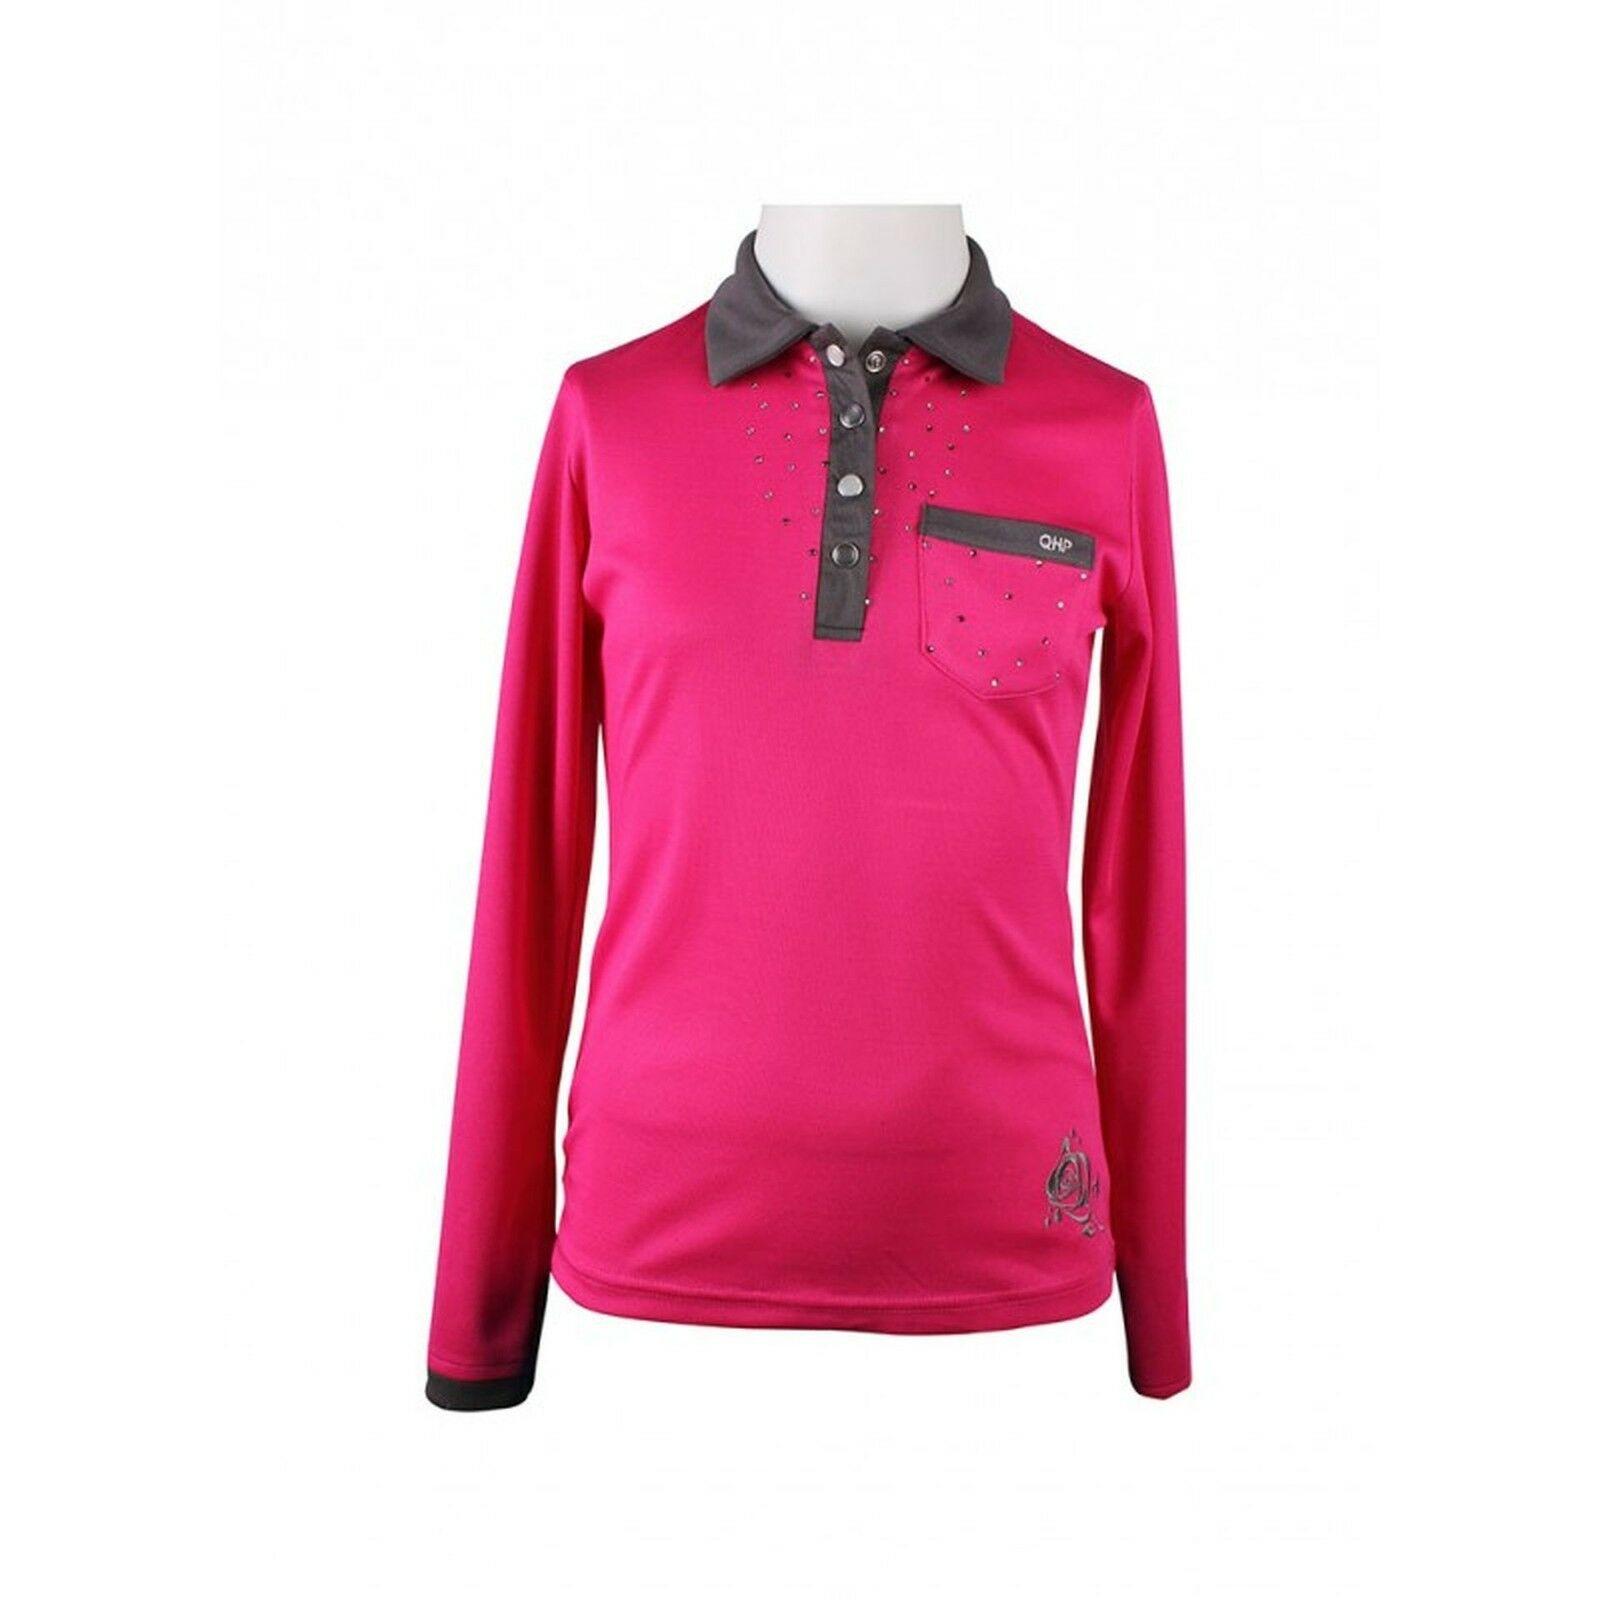 Polos & Shirts Damen-Reitbekleidung QHP Damen Polo-Shirt Luna kurzarm Kragen Basismodell Anthrazit